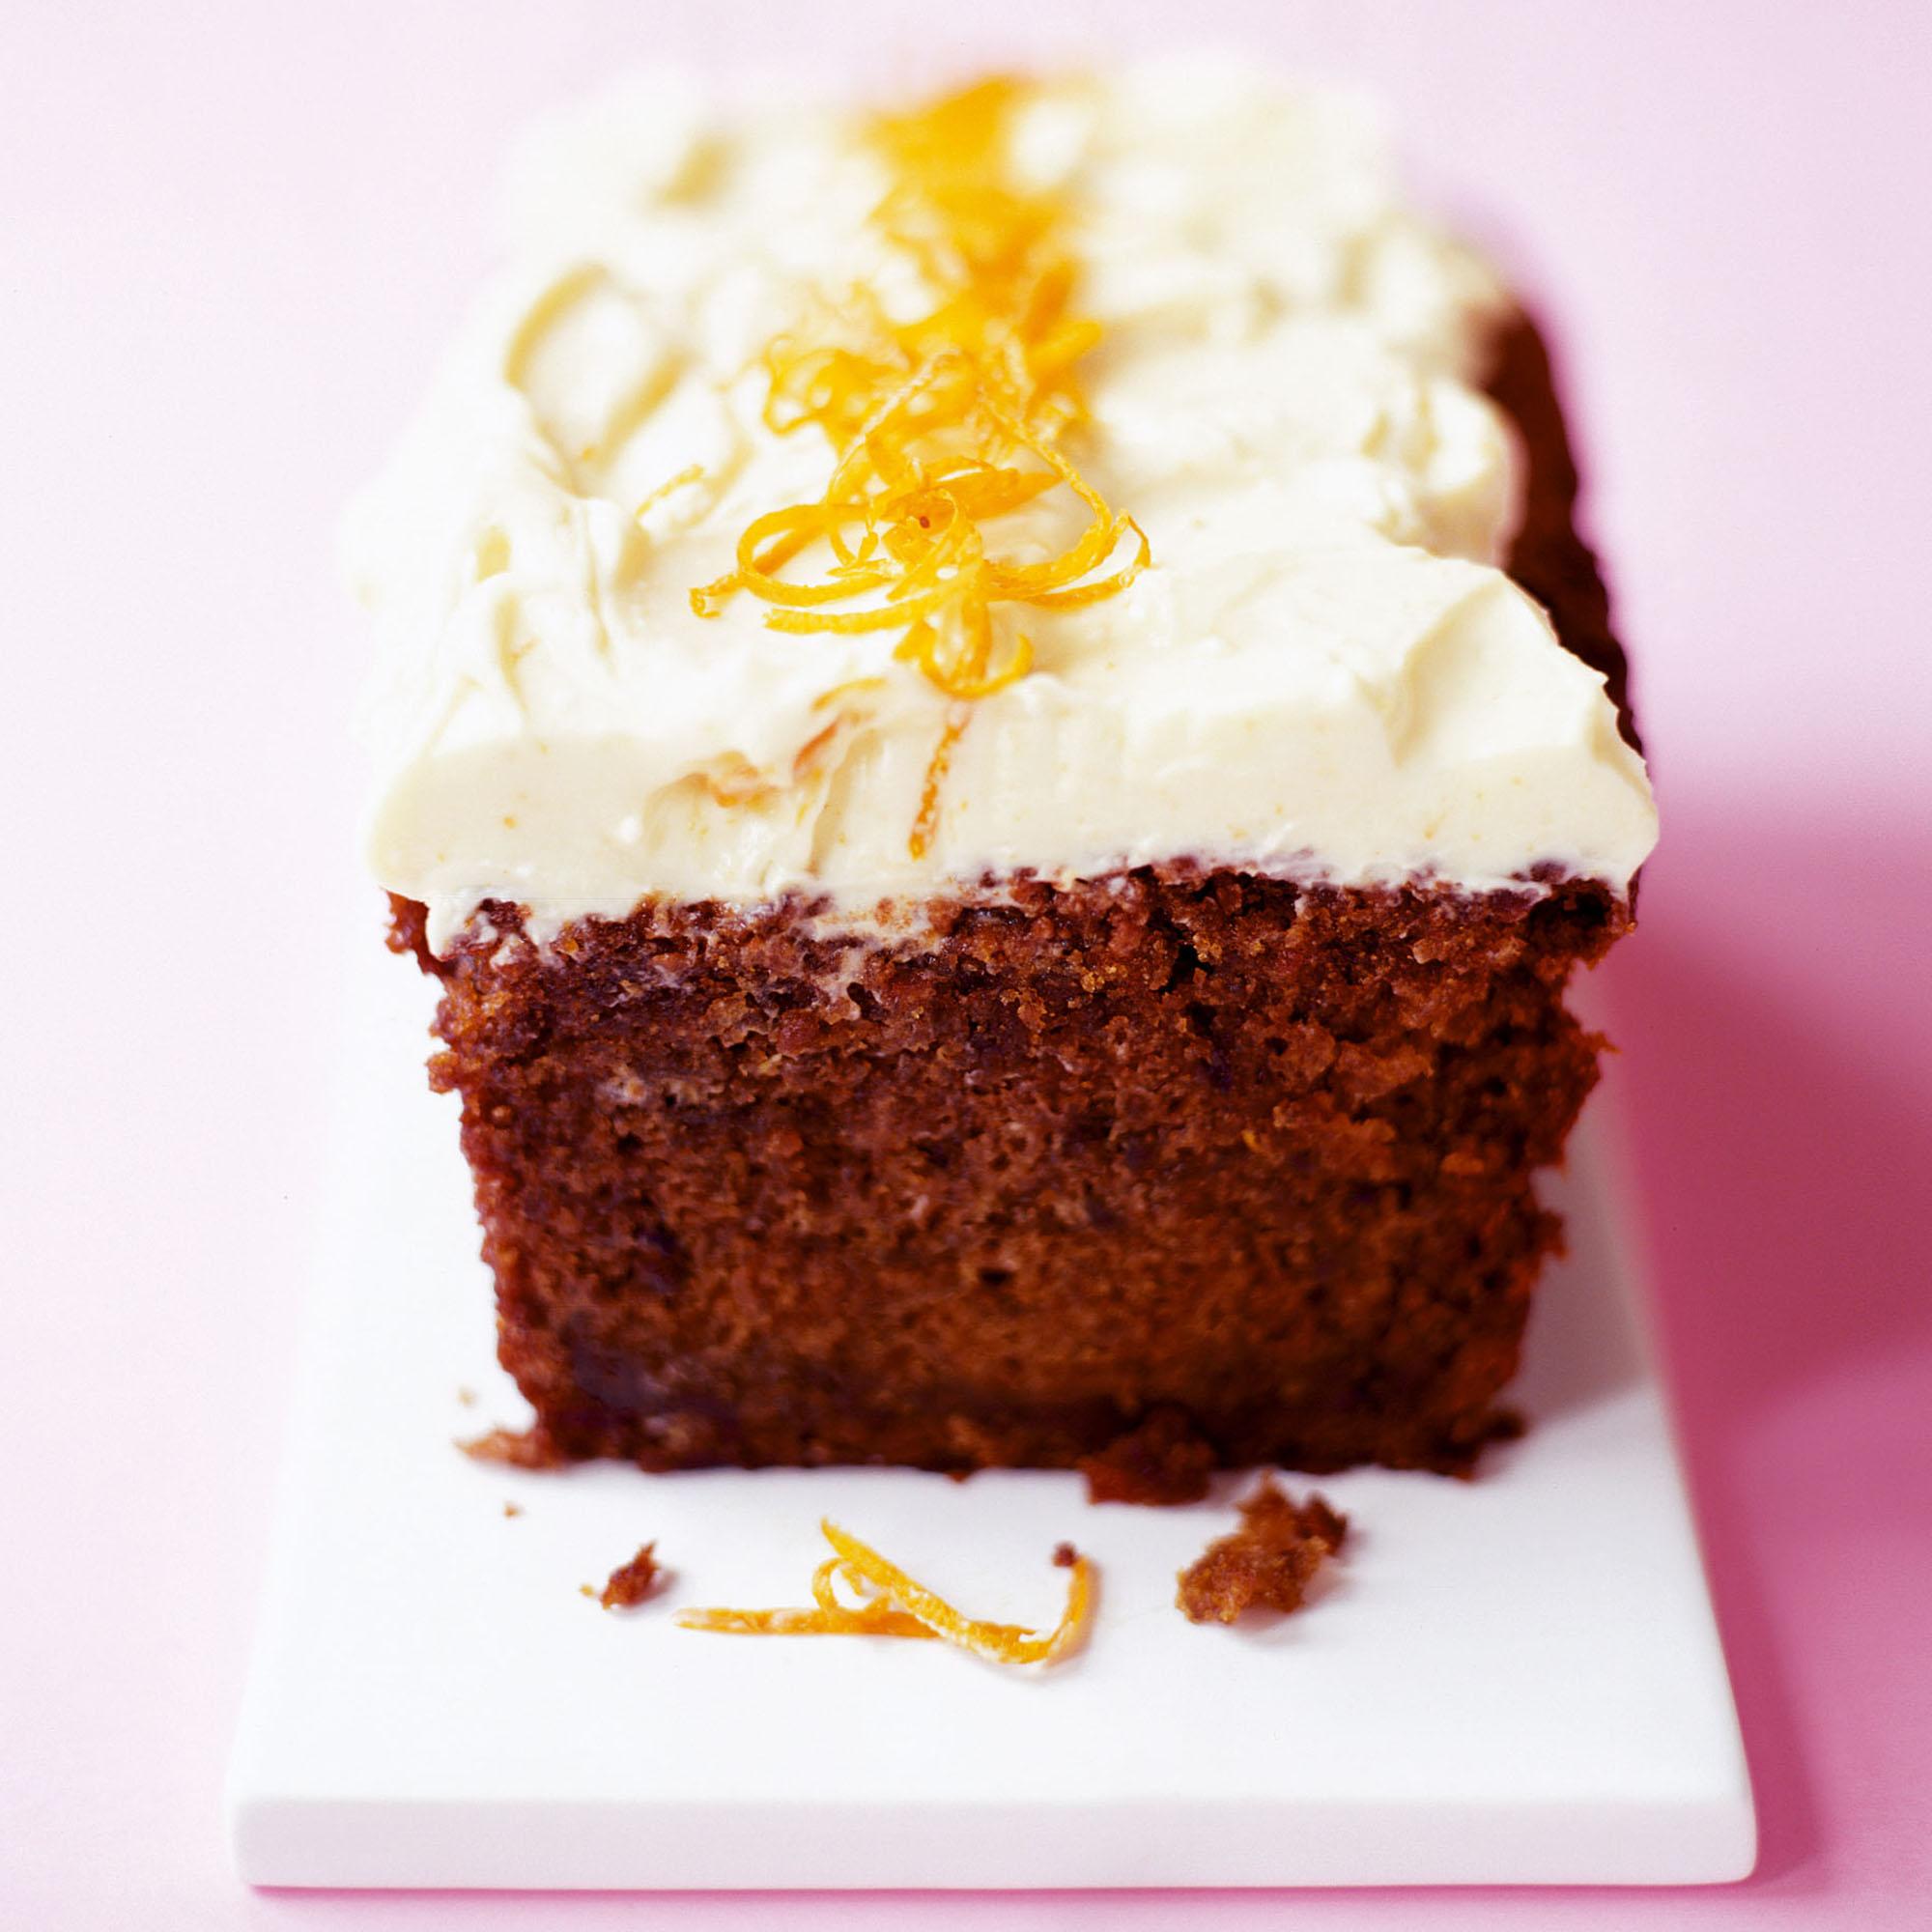 Beetroot Cake With Orange Frosting Dessert Recipes